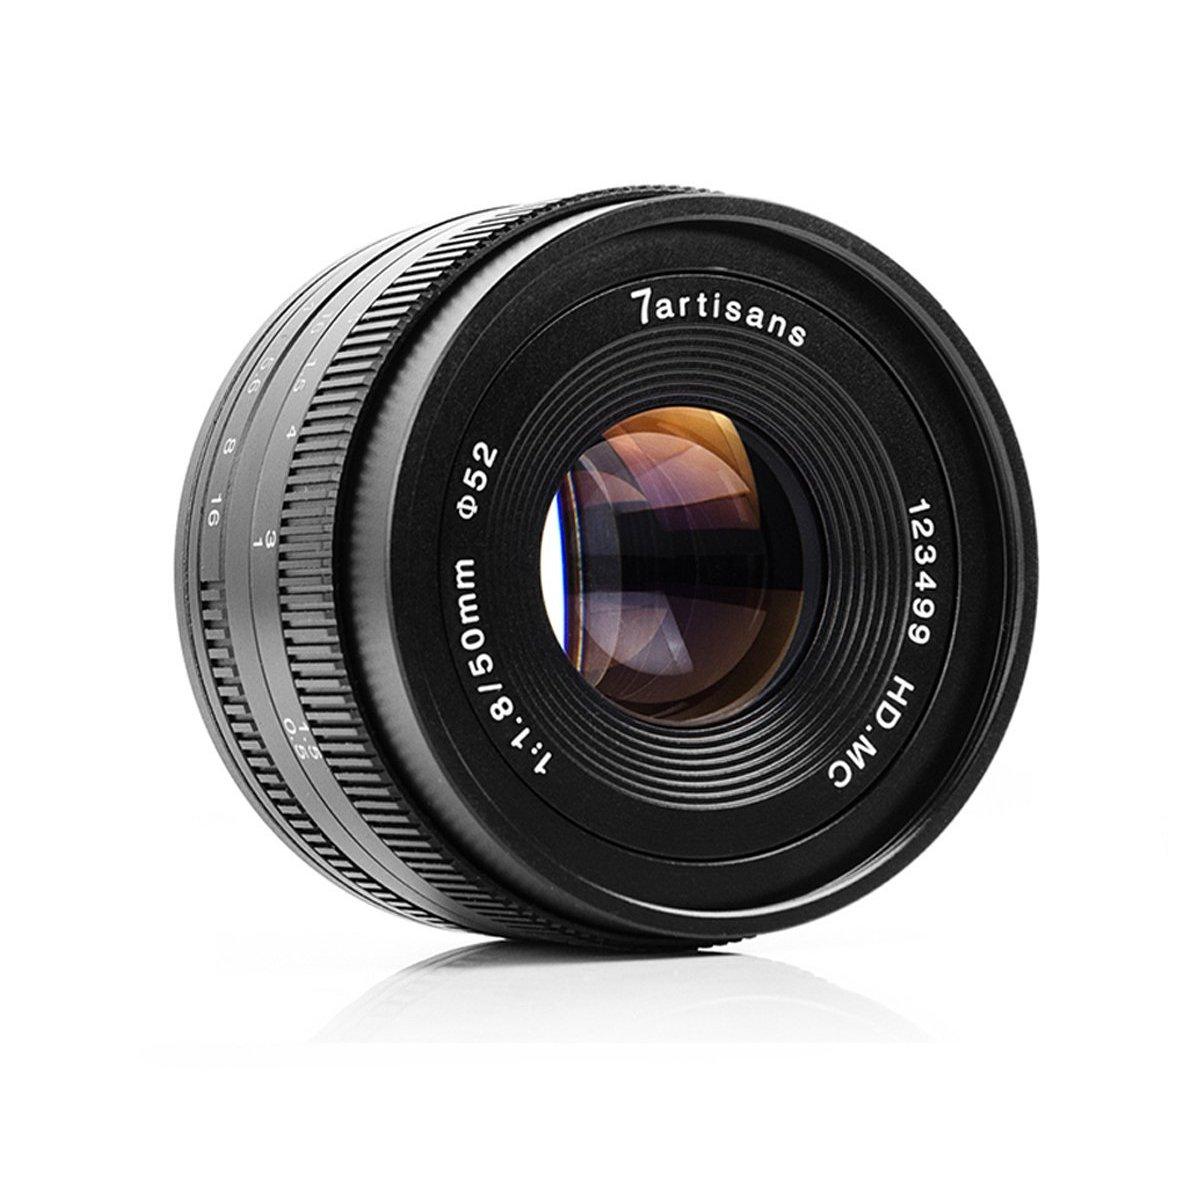 7artisans 50mm F1.8ソニーA6500 A6300 A6000 A5100 A5000 NEX-3 NEX-3N NEX-3R NEX-C3 NEX-F3KのようなソニーEマウントミラーレスカメラ用APS-C手動固定レンズ   B07FML5MY9